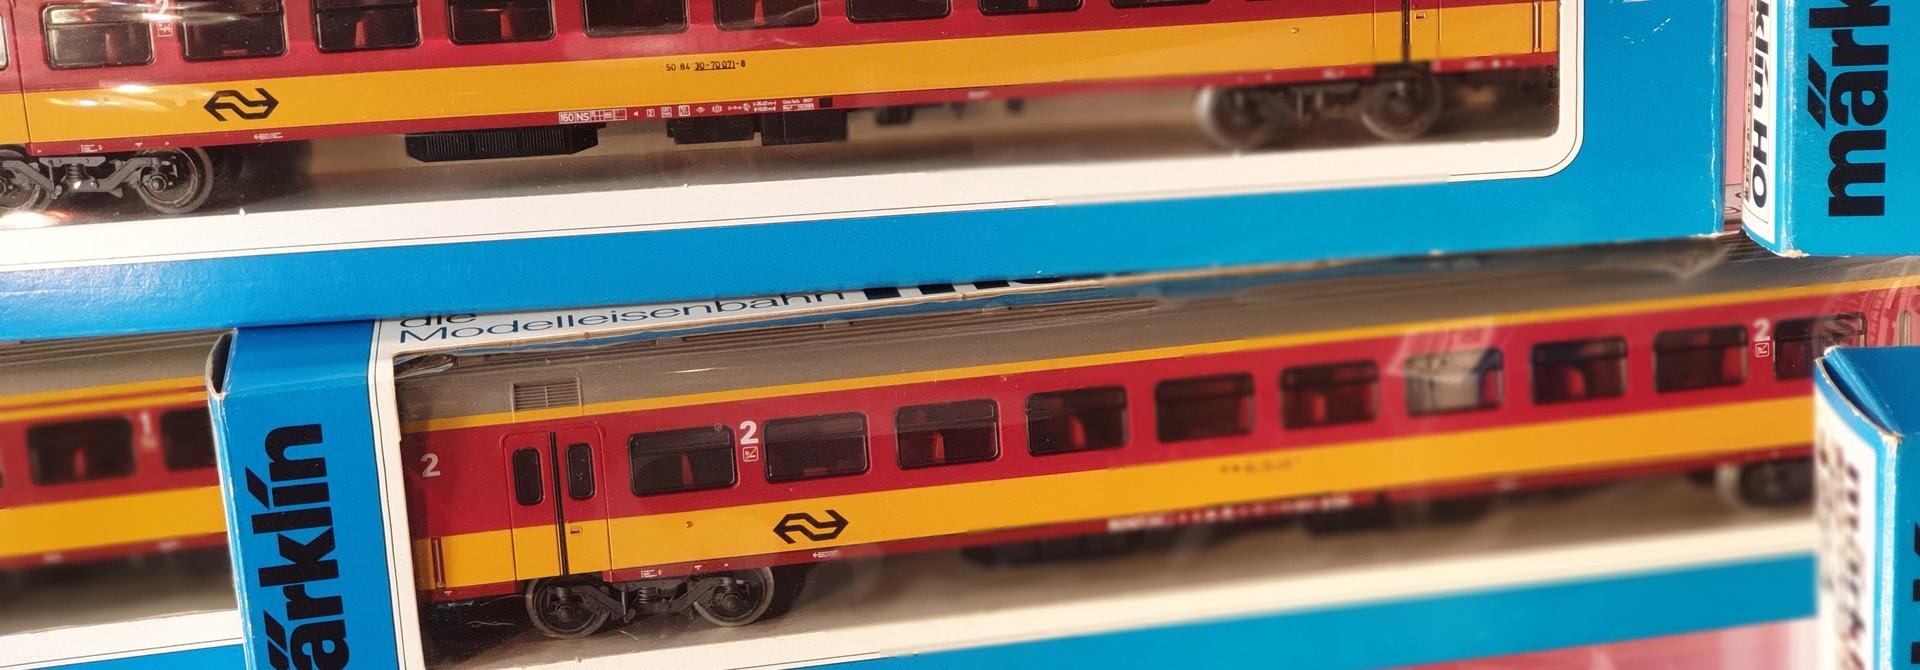 4263 Benelux Intercity rijtuig 2e klasse